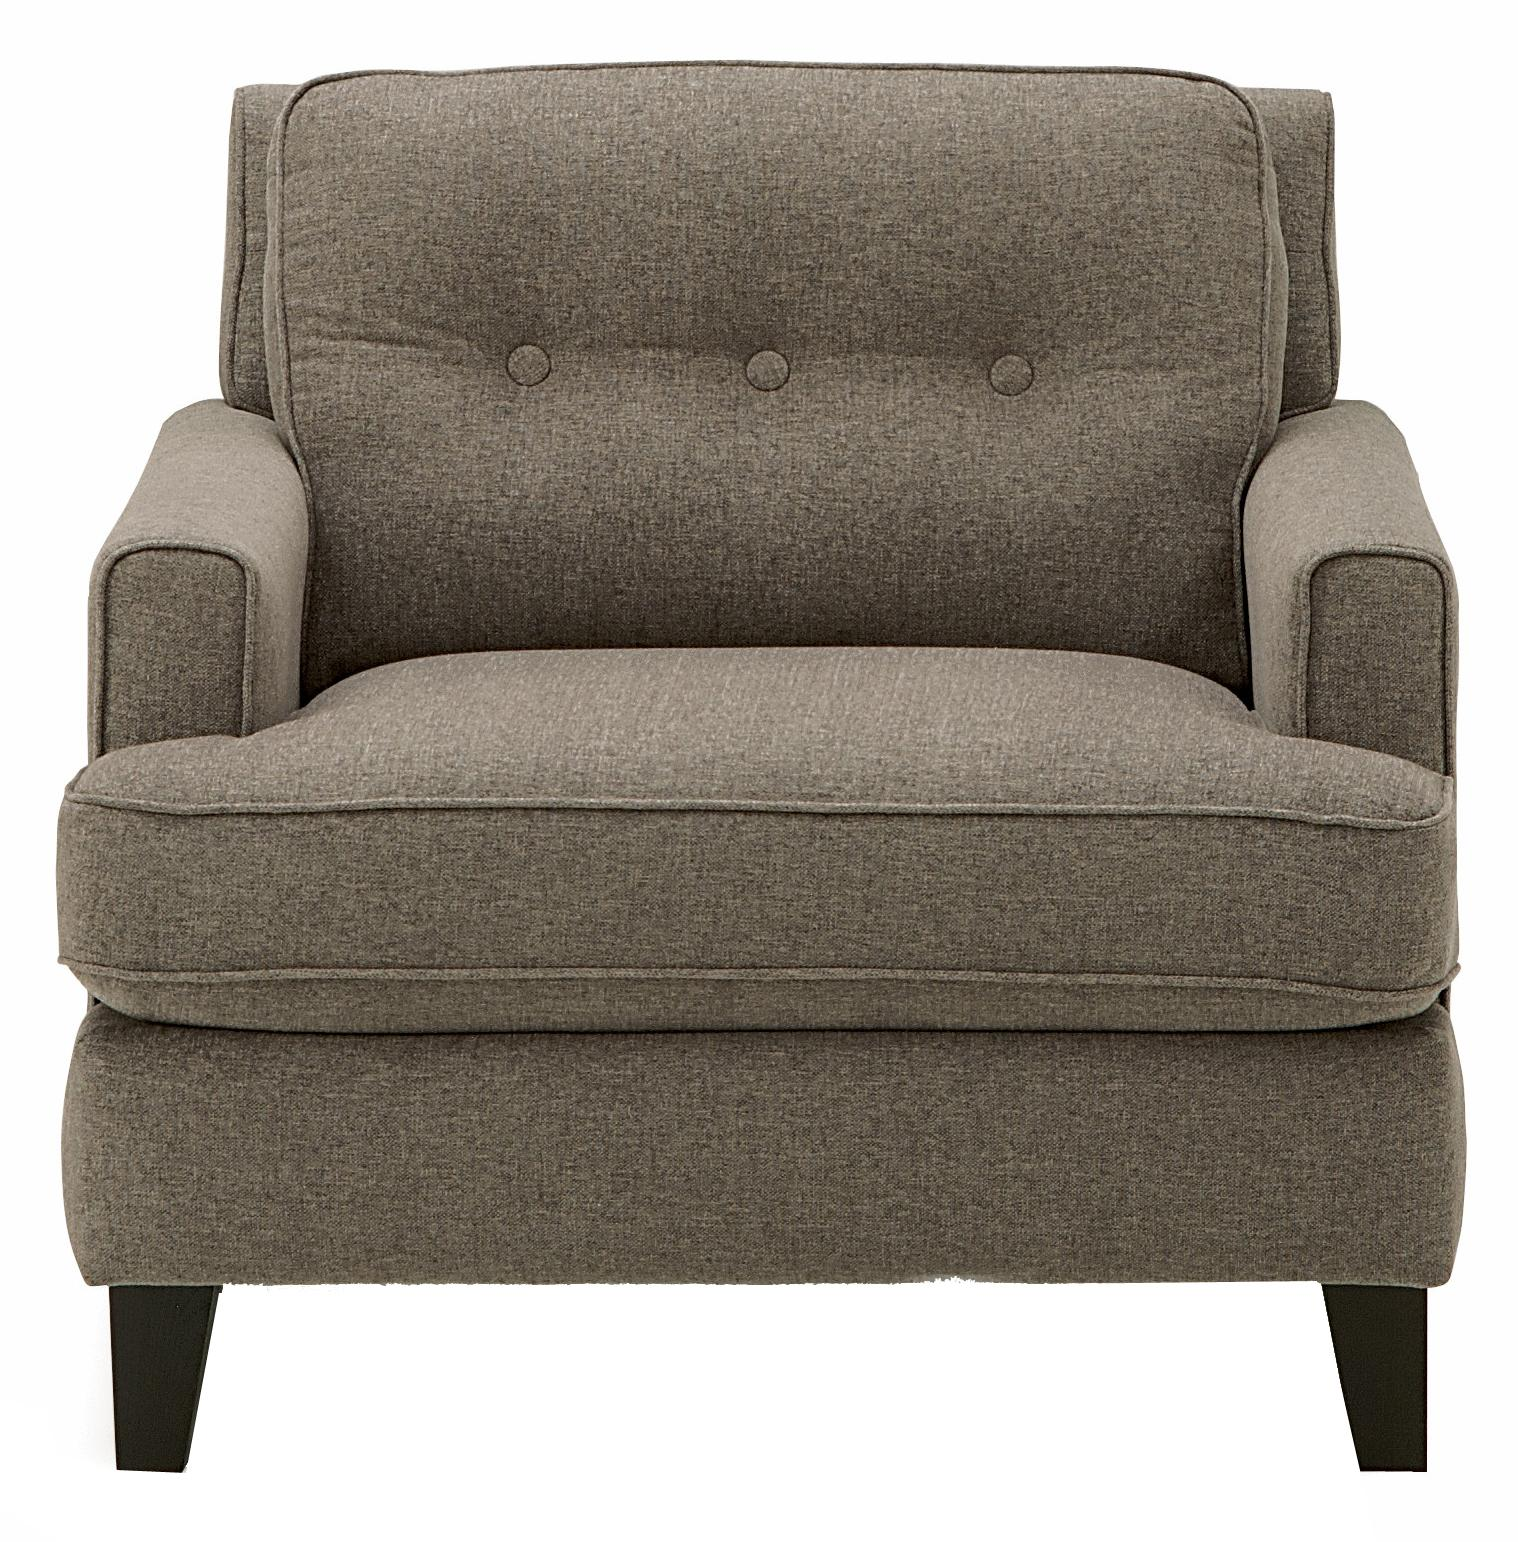 Barbara Chair by Palliser at Jordan's Home Furnishings